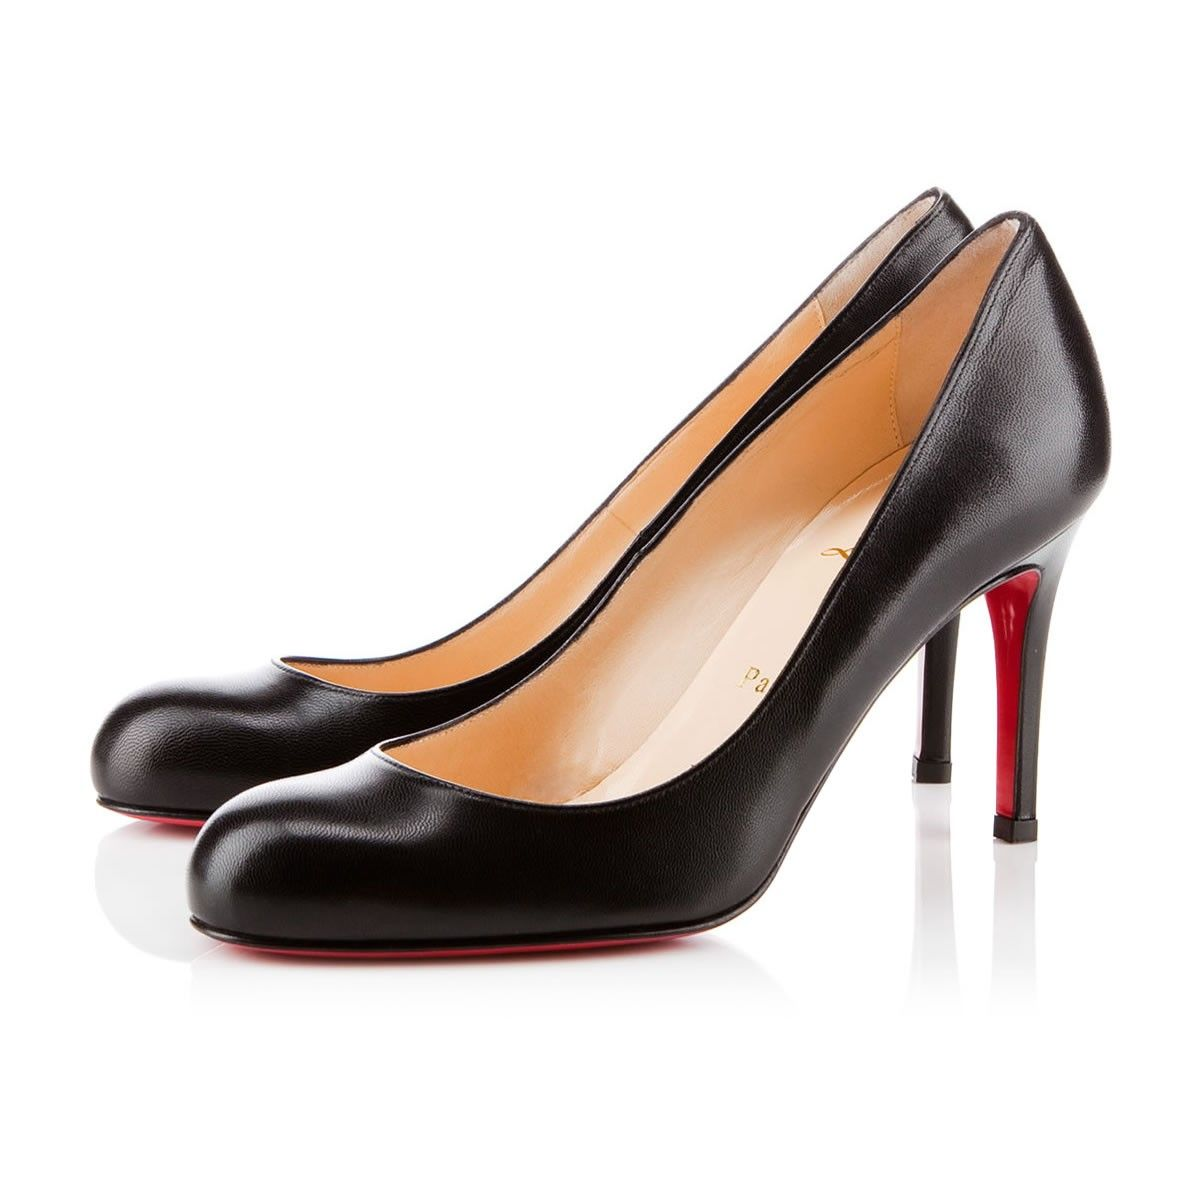 Simple pump, Christian louboutin, Heels